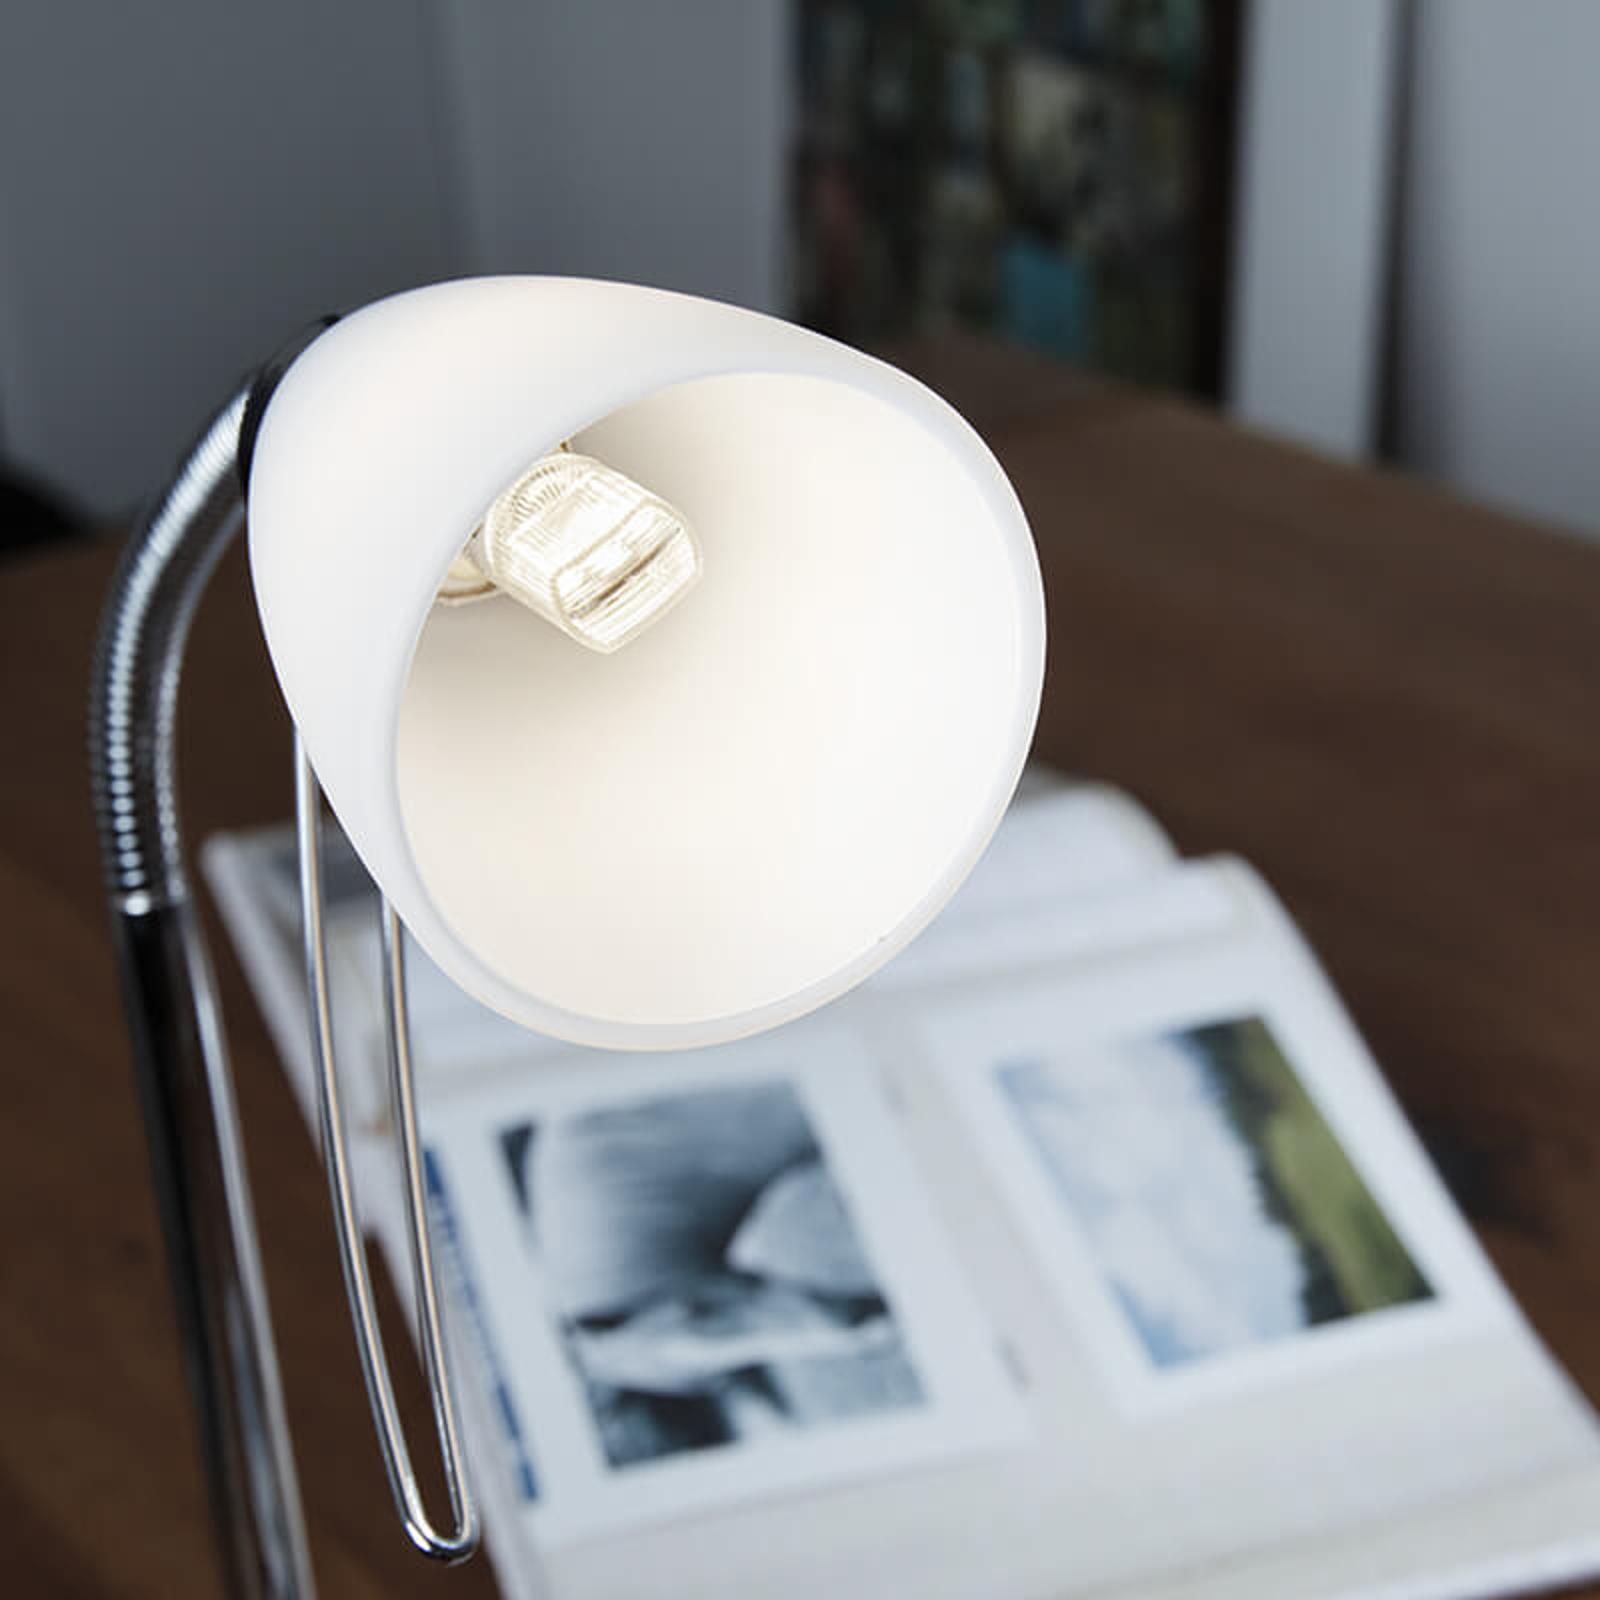 OSRAM LED bispina G9 3,8W, bianco neutro 470 lm